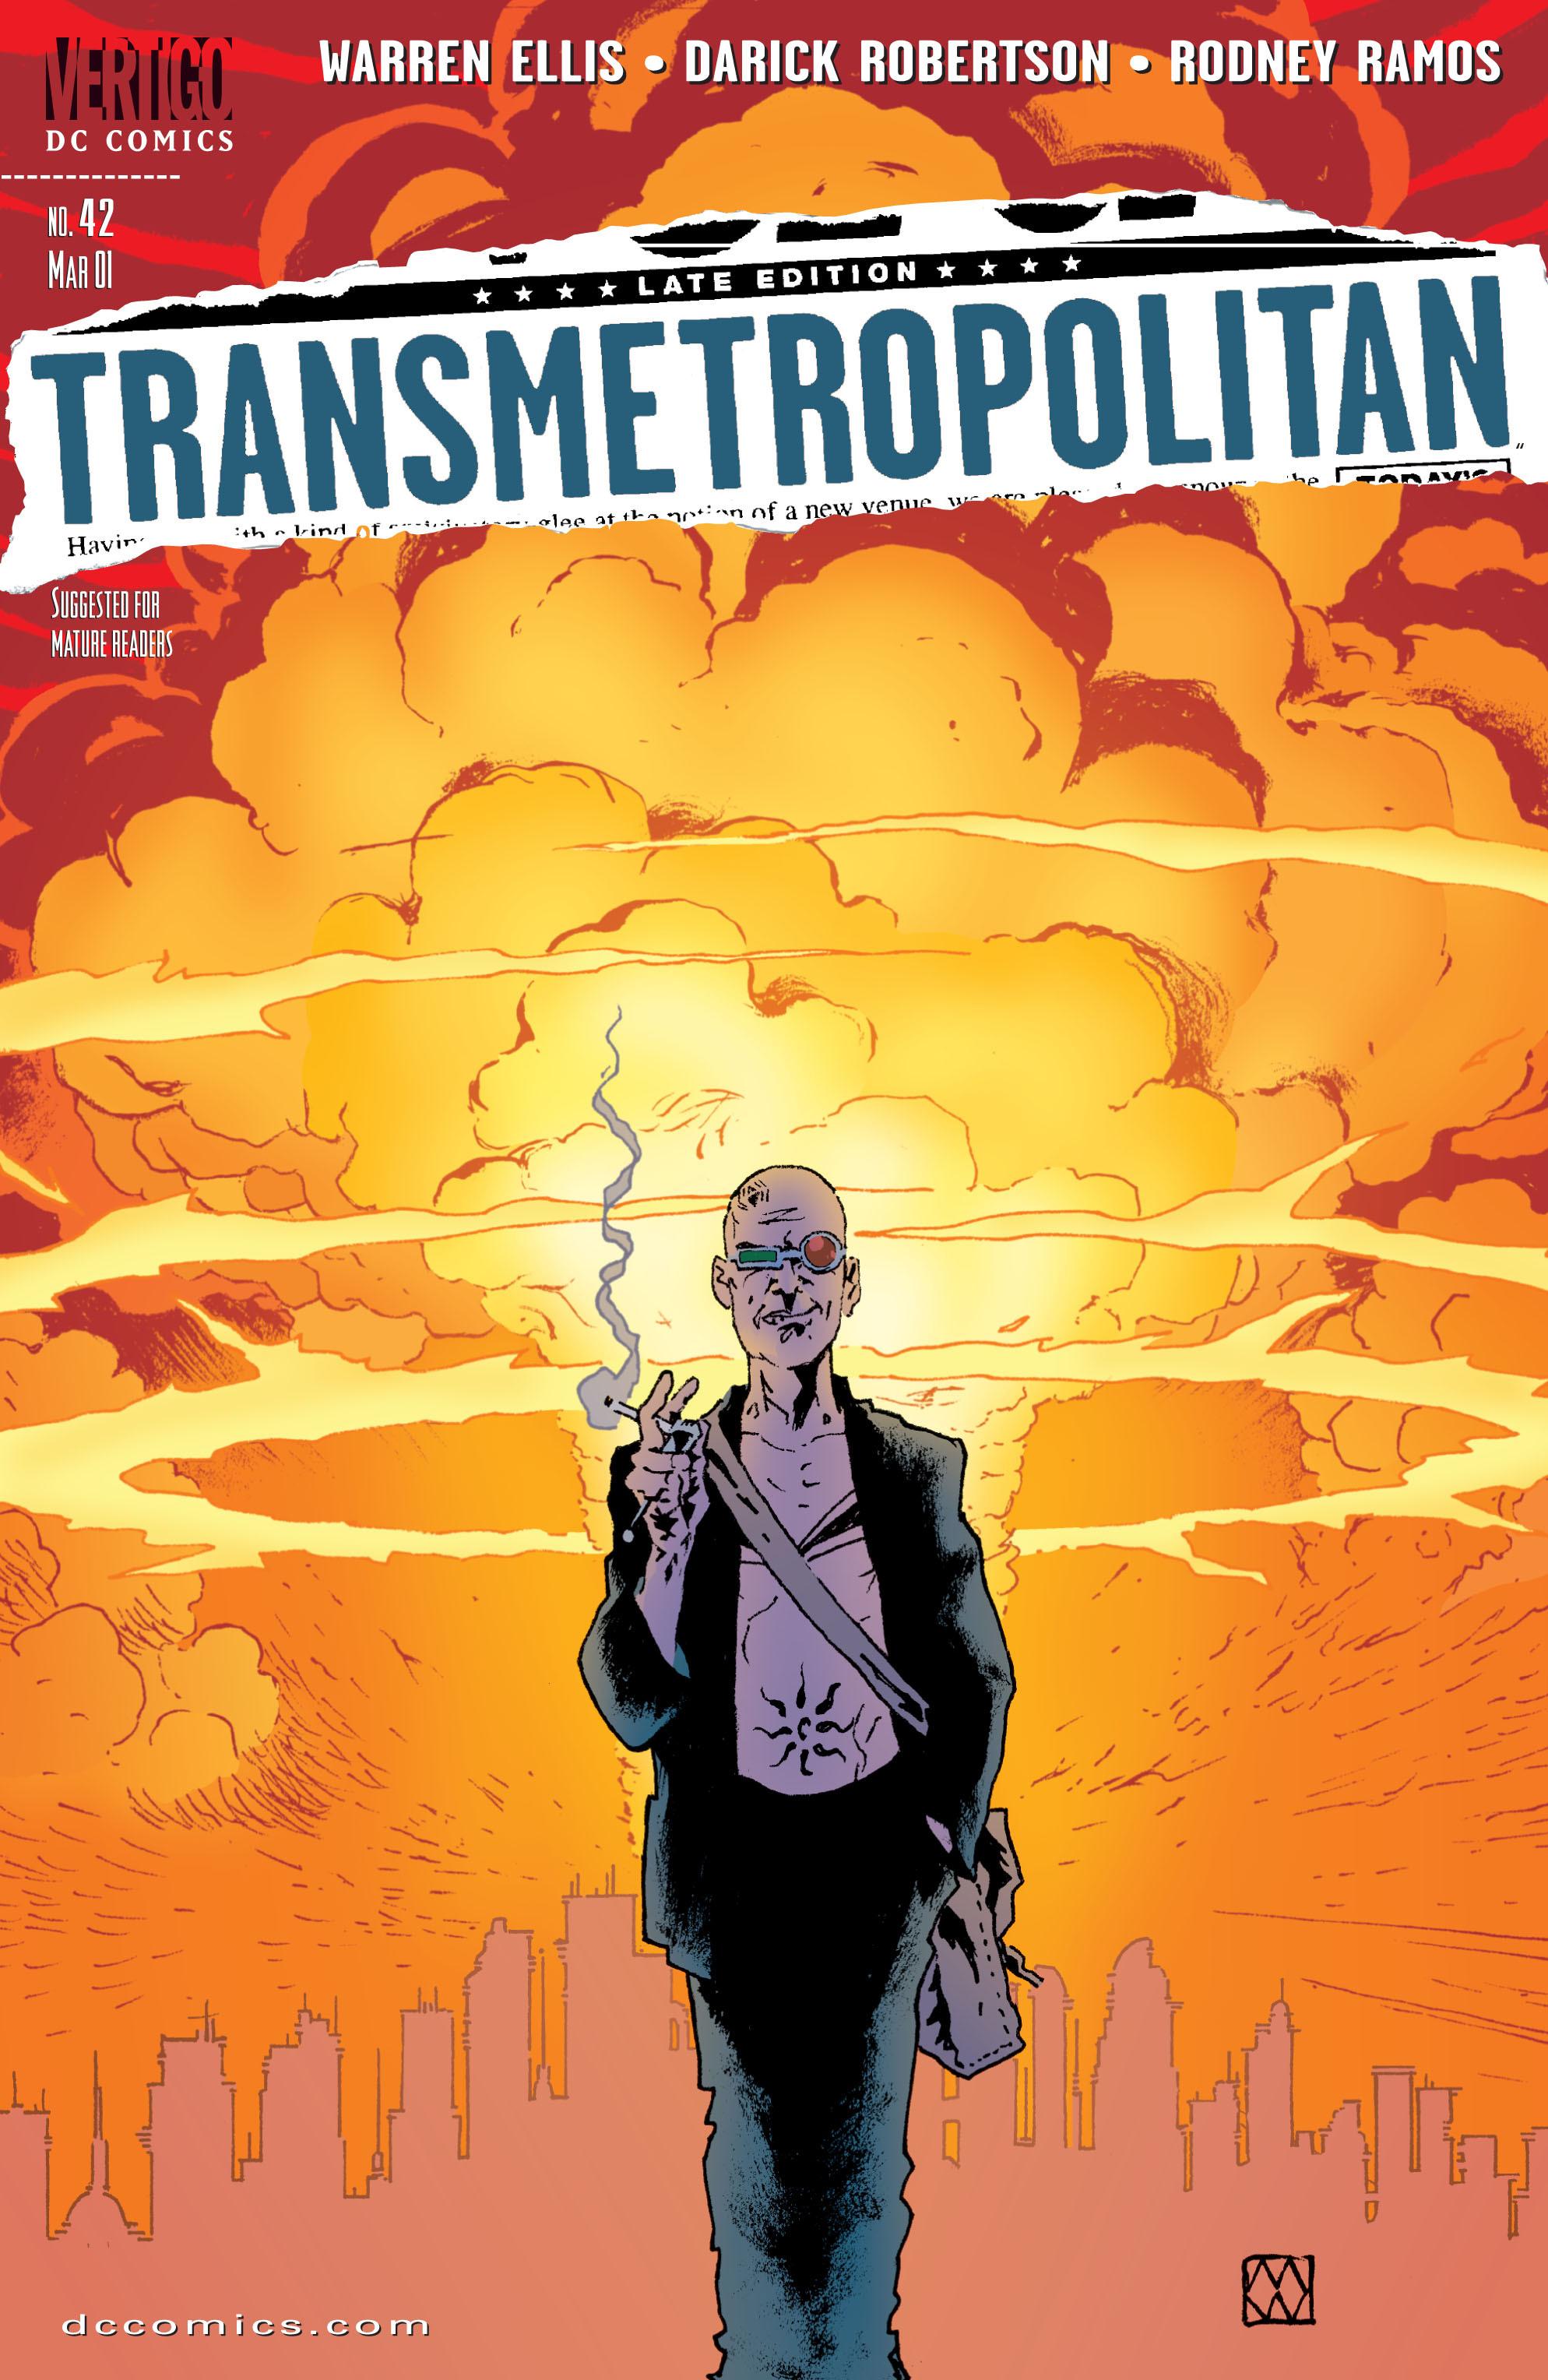 Read online Transmetropolitan comic -  Issue #42 - 1